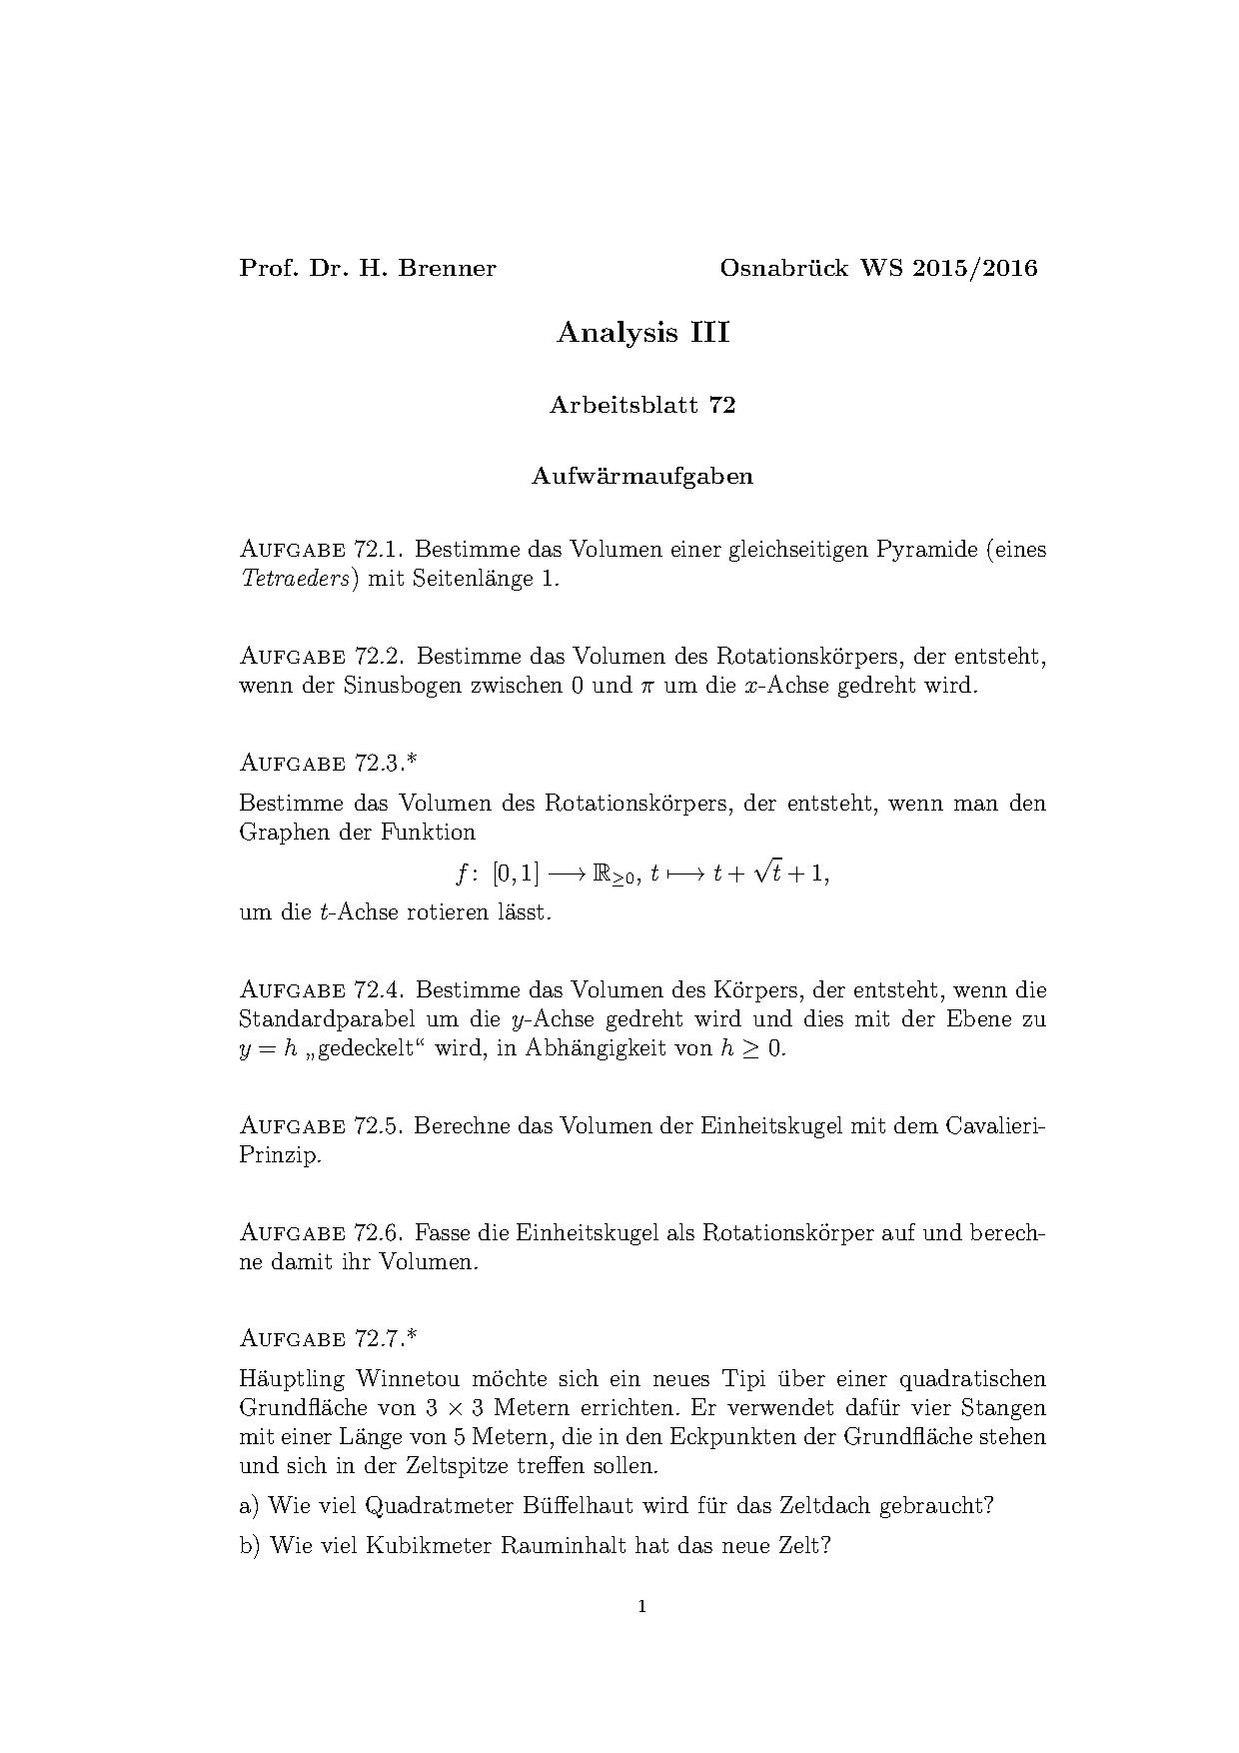 File:Analysis (Osnabrück 2014-2016)Teil IIIArbeitsblatt72.pdf ...